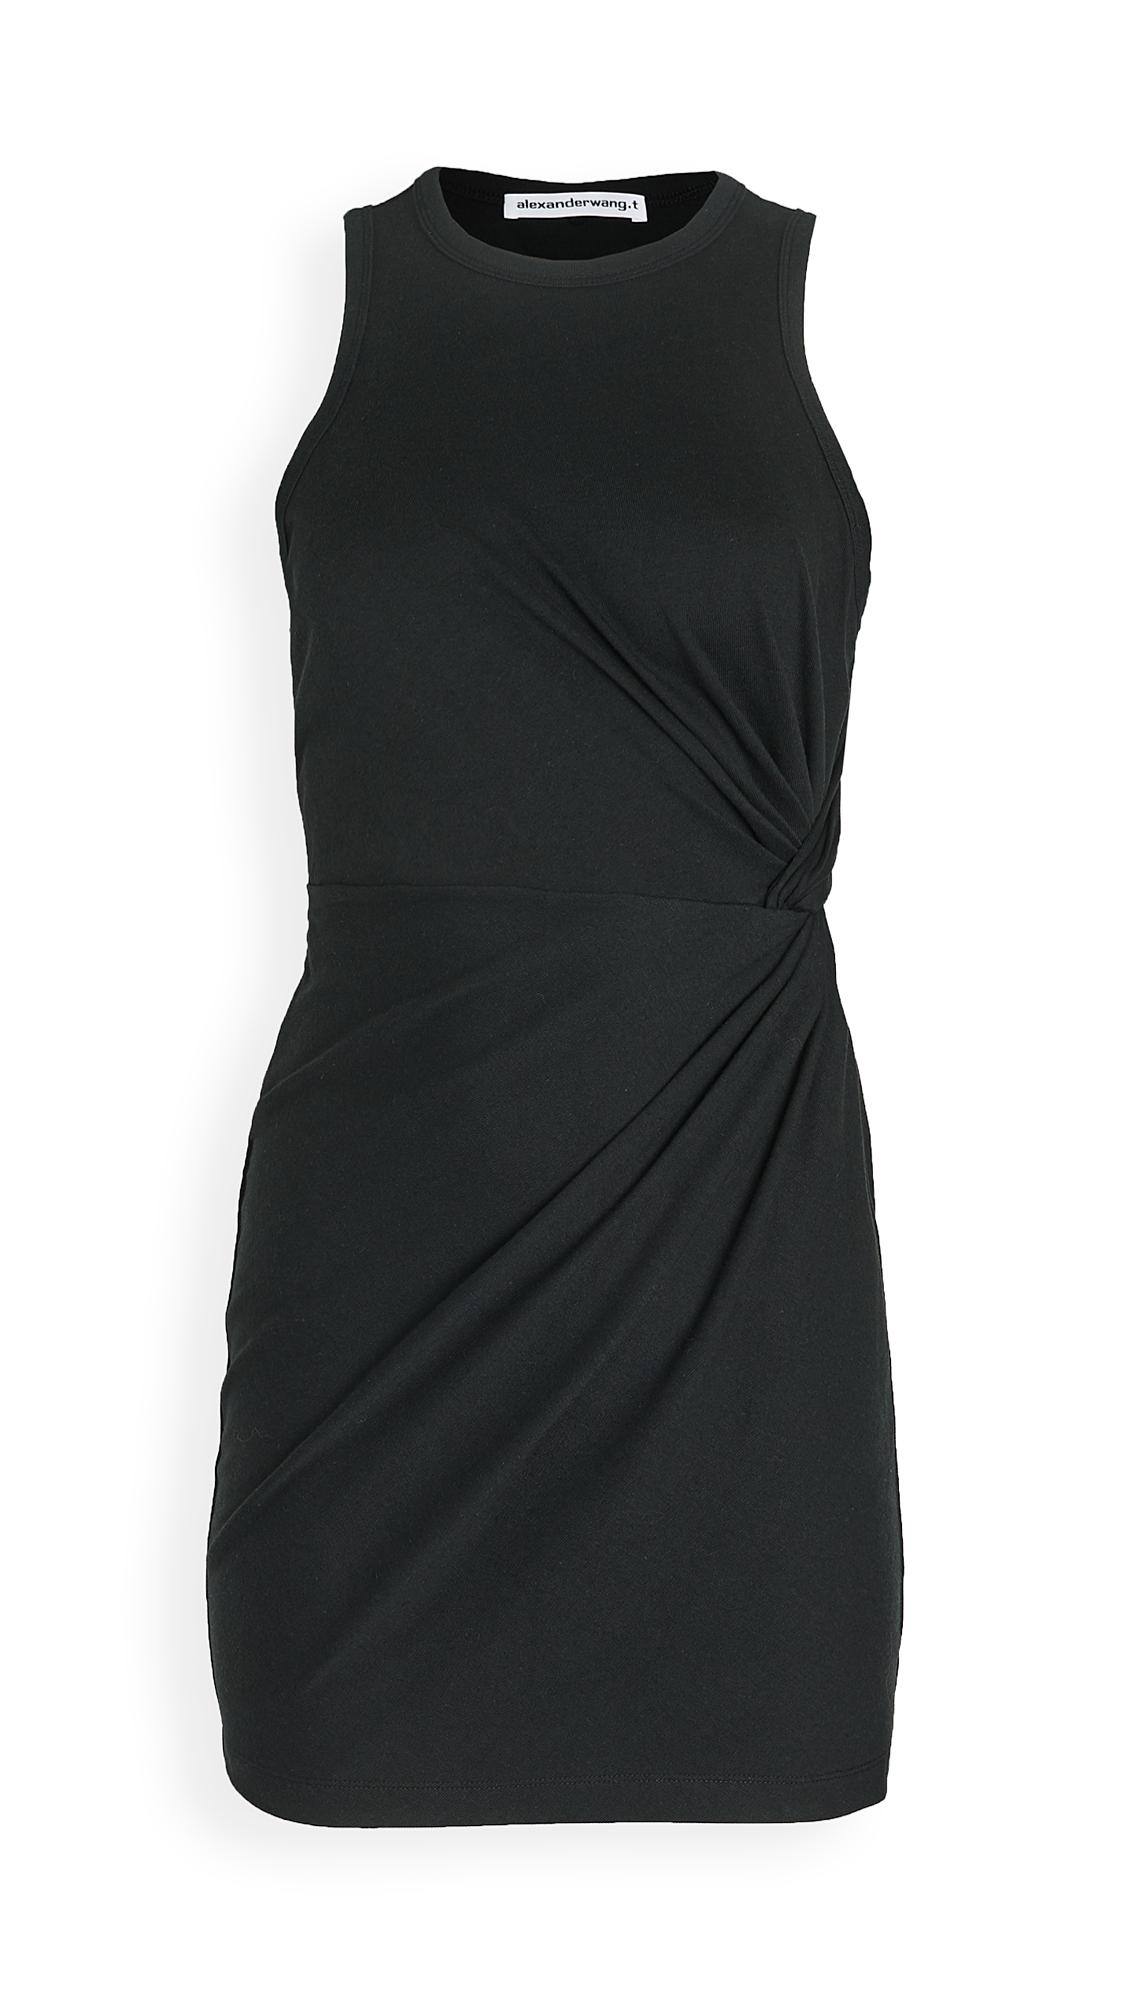 alexanderwang.t Heavy Soft Jersey Fitted Tank Dress